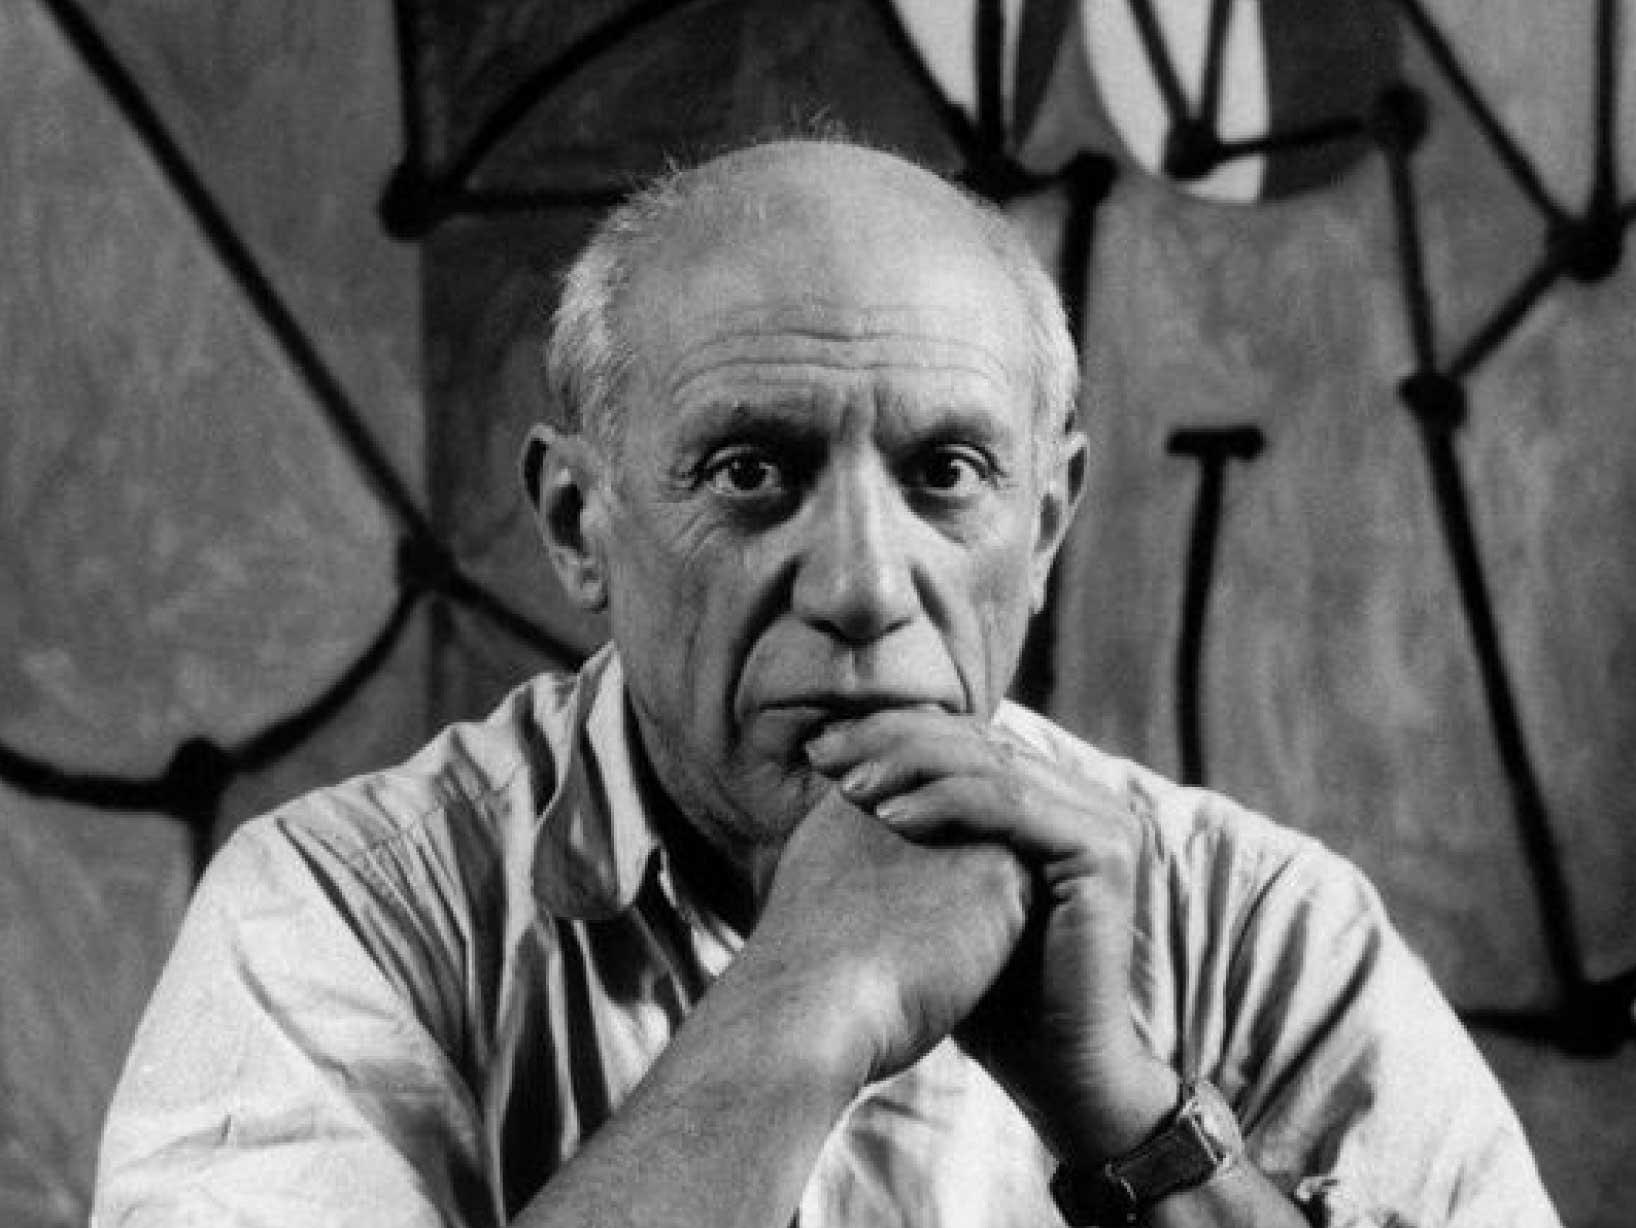 Pablo Picasso パブロピカソ